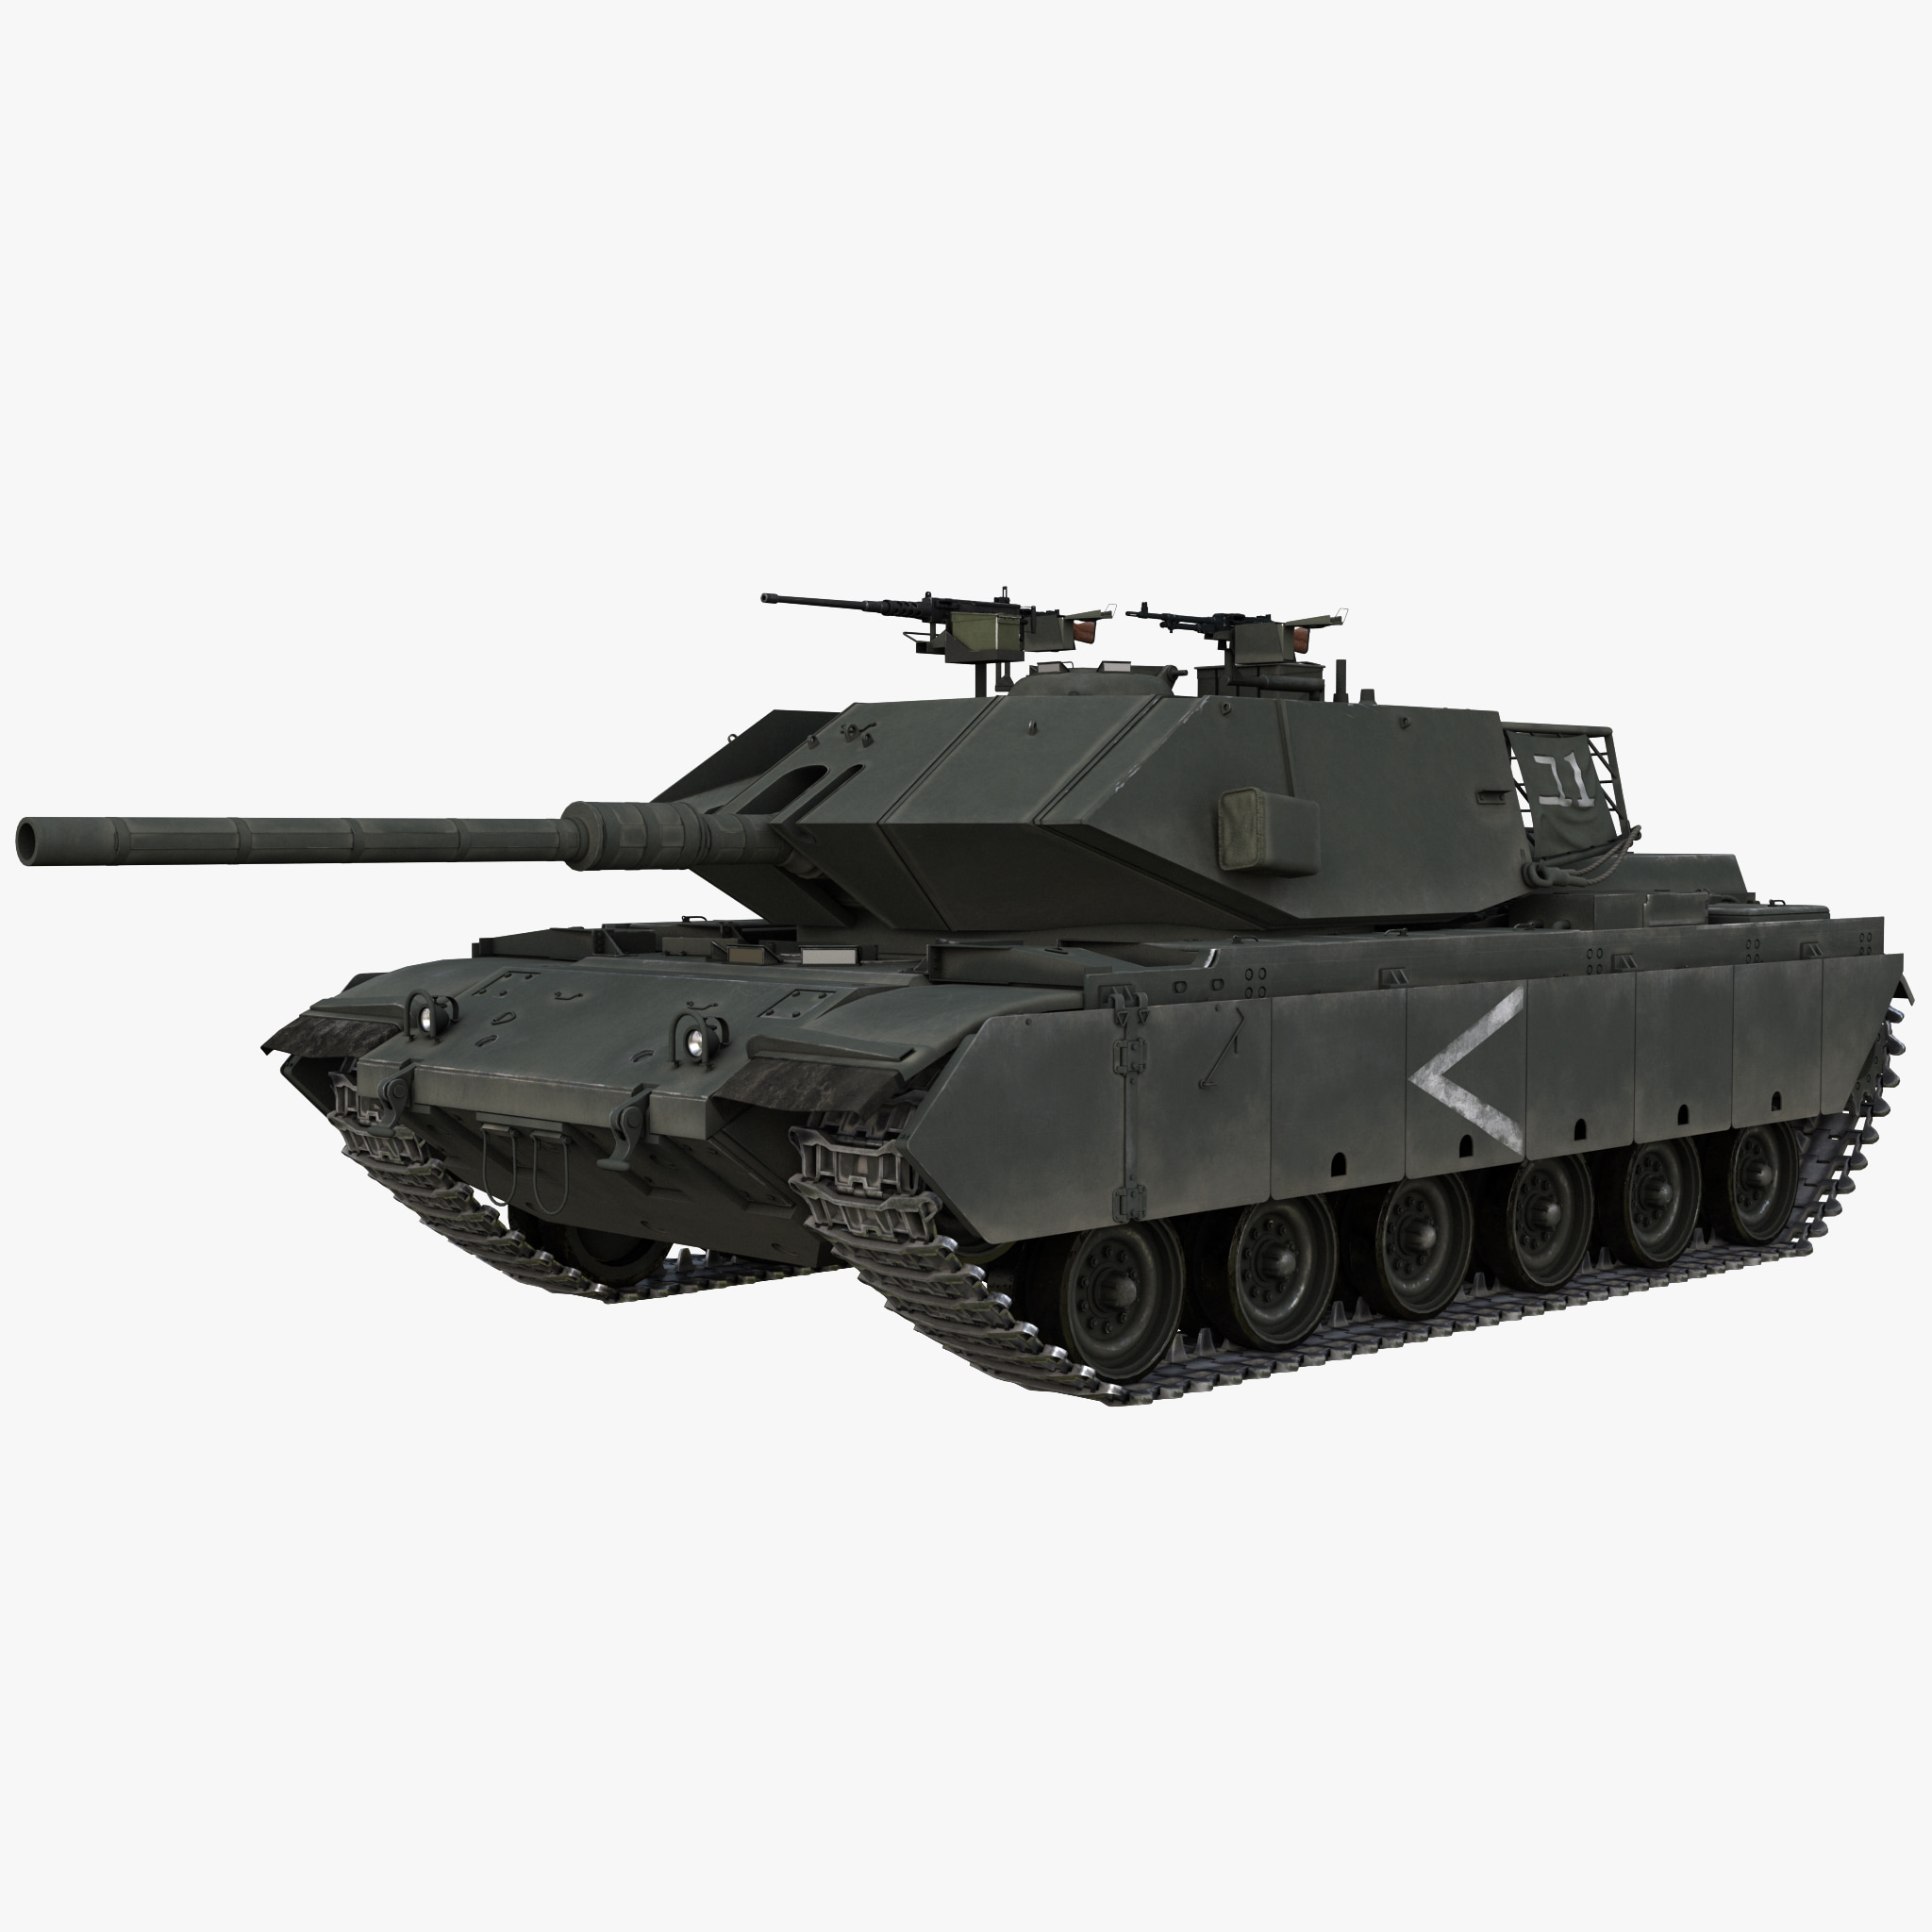 Magach 7 Israel Main Battle Tank_1.jpg